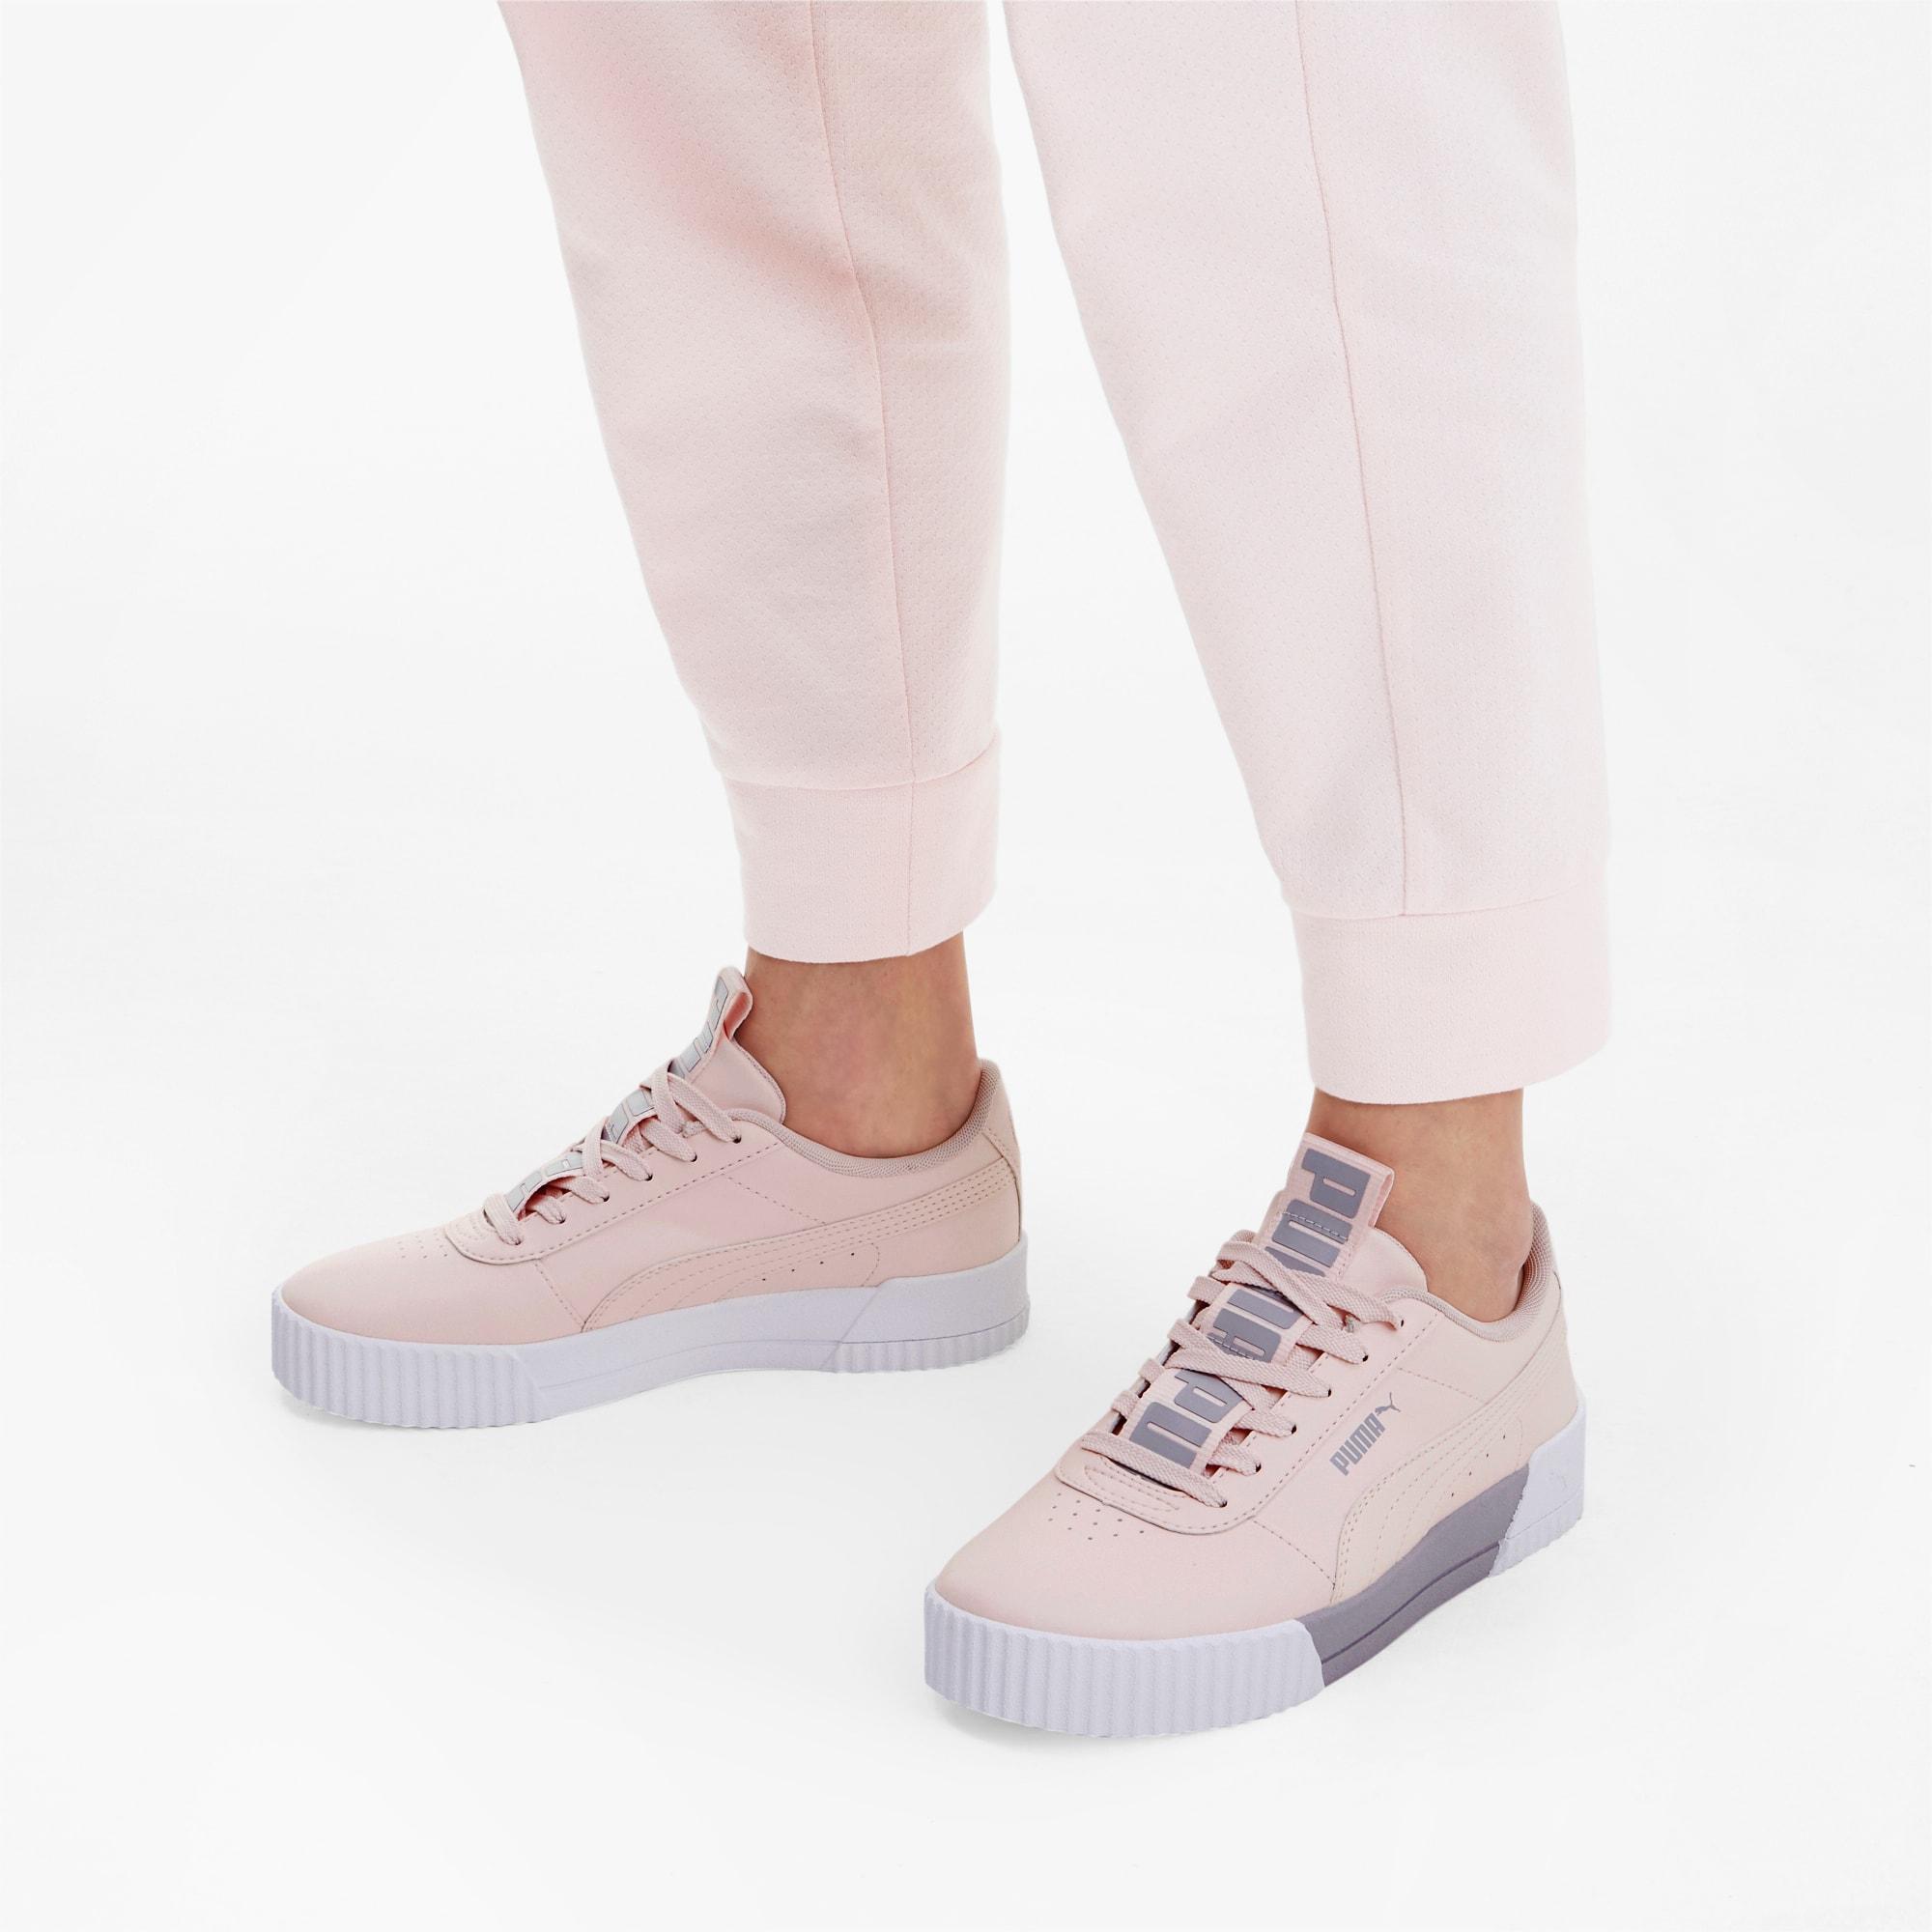 Zapatos deportivos Carina Bold para mujer